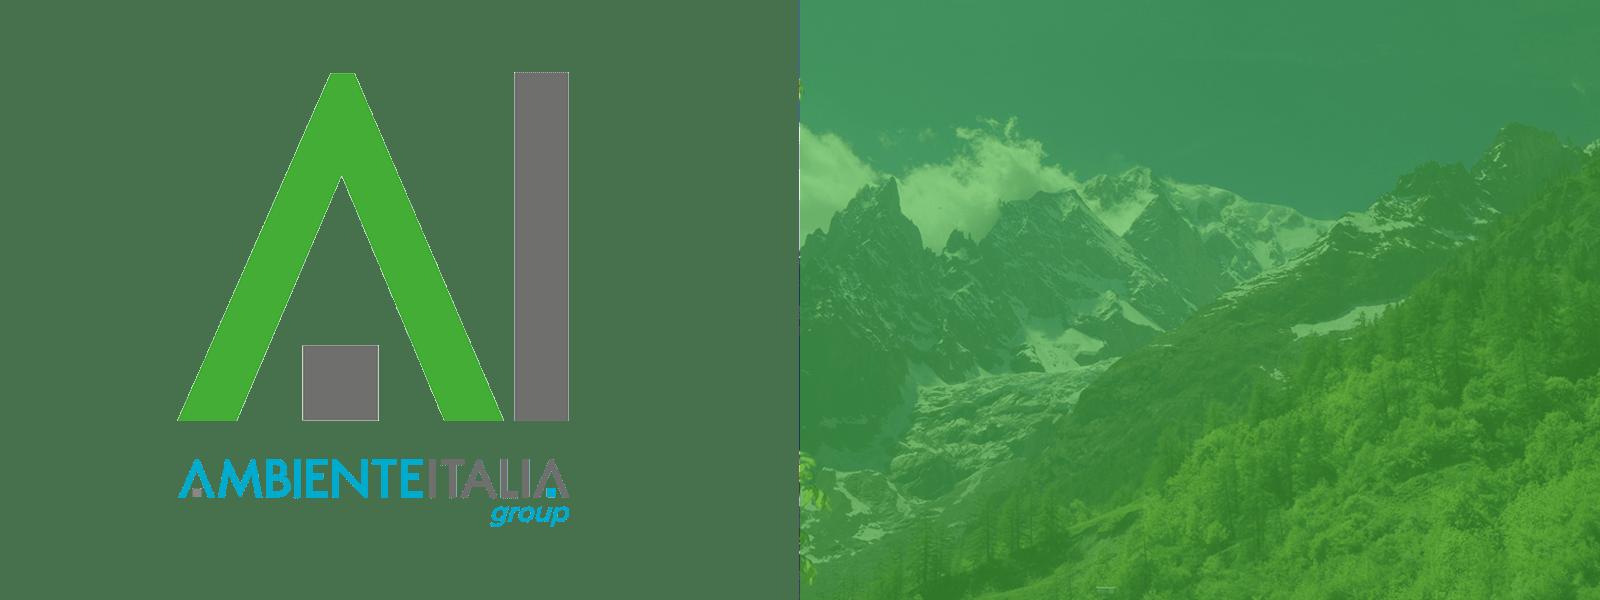 Case Study Valle d'Aosta